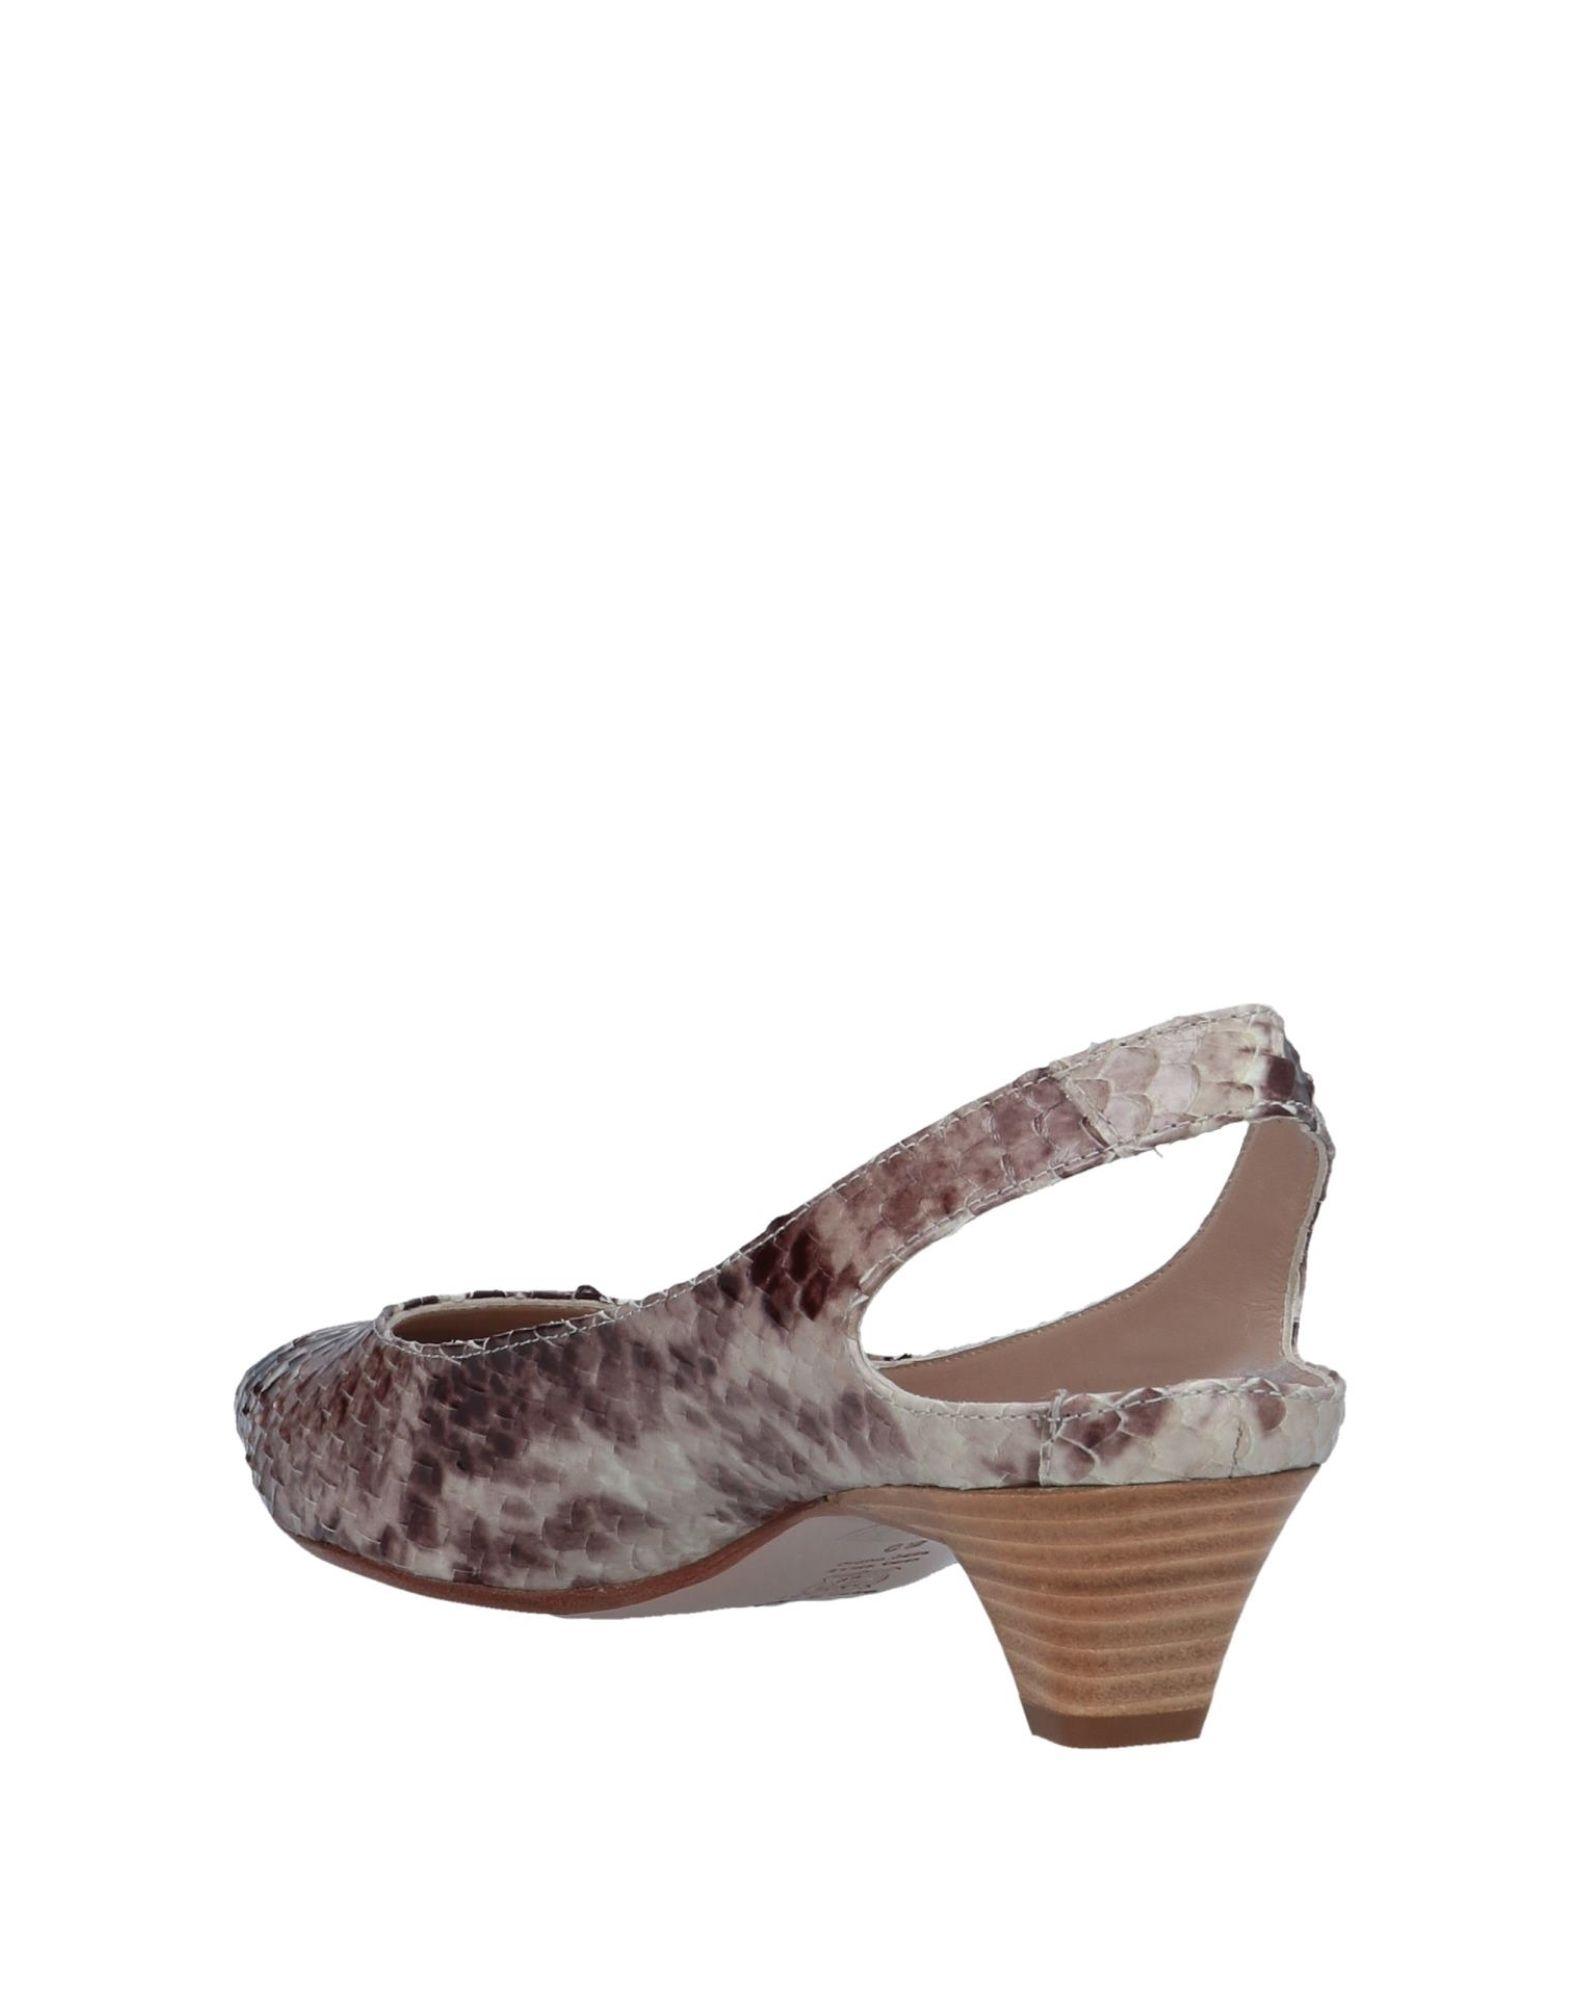 Betti Oliva Pumps Damen beliebte  11558923PB Gute Qualität beliebte Damen Schuhe c2693b